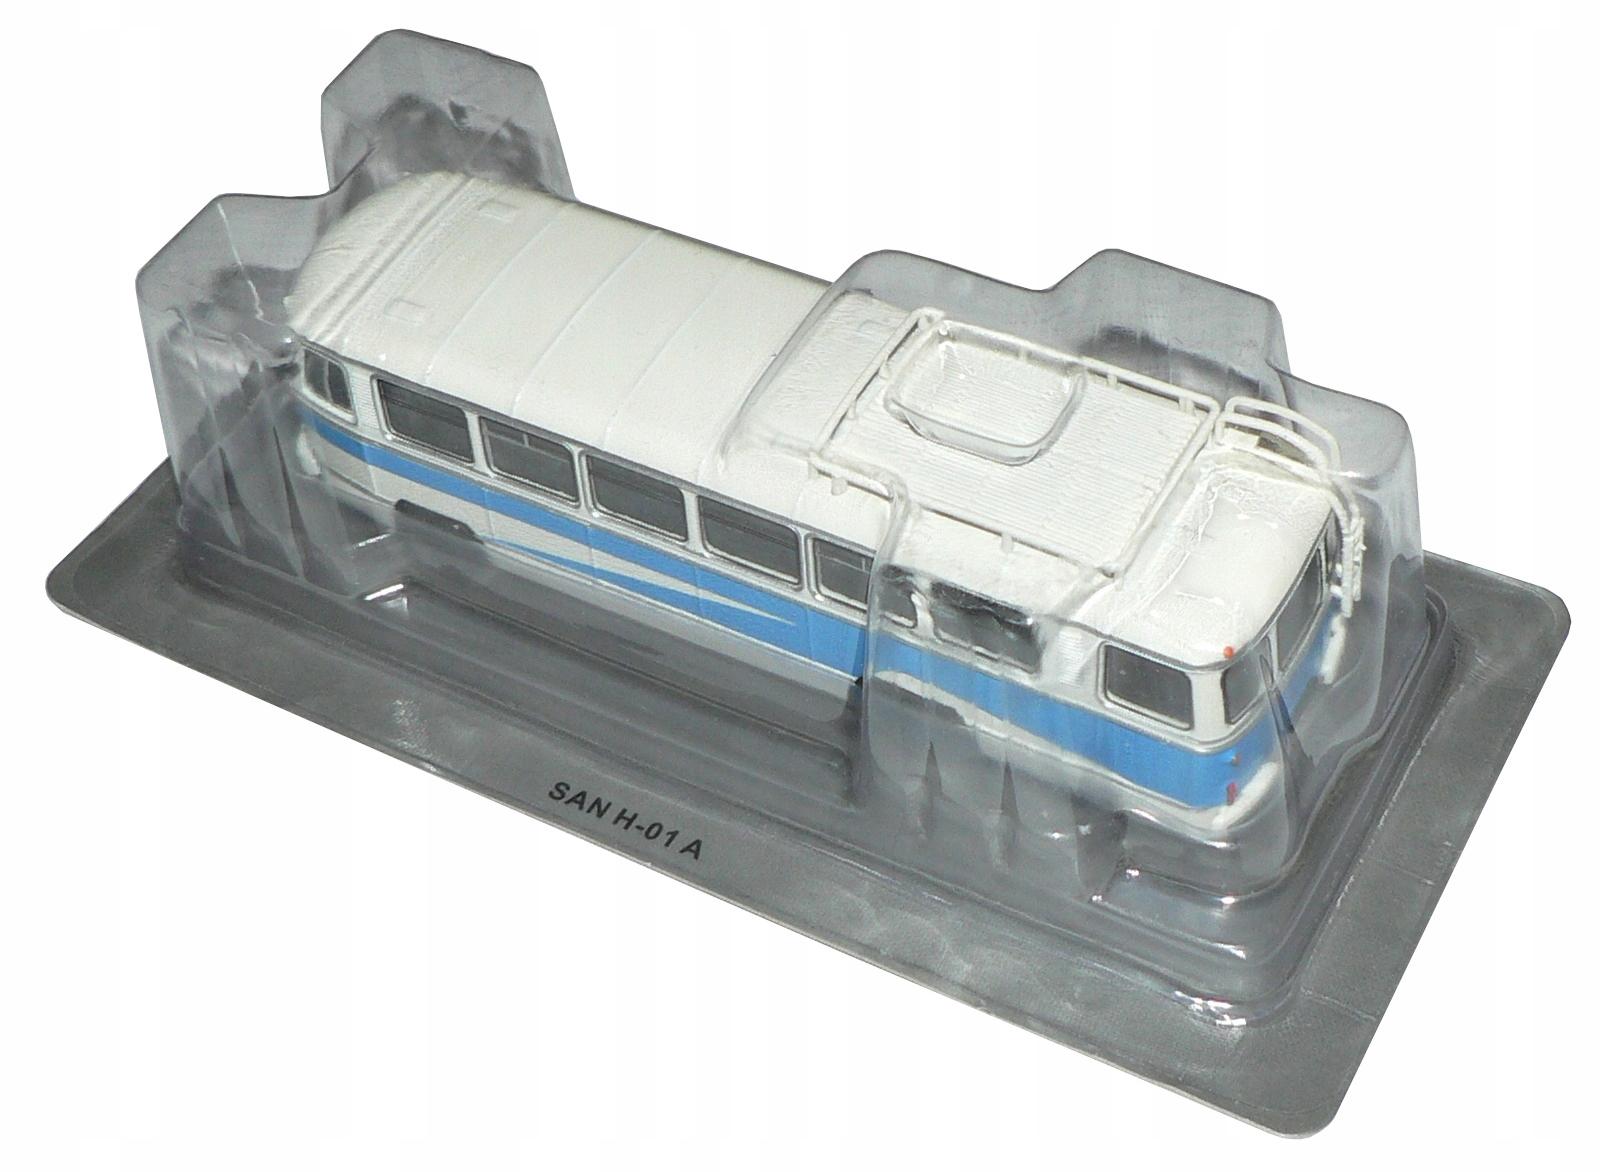 Kultowe autobusy PRL 51 - SAN H01A !!!!!